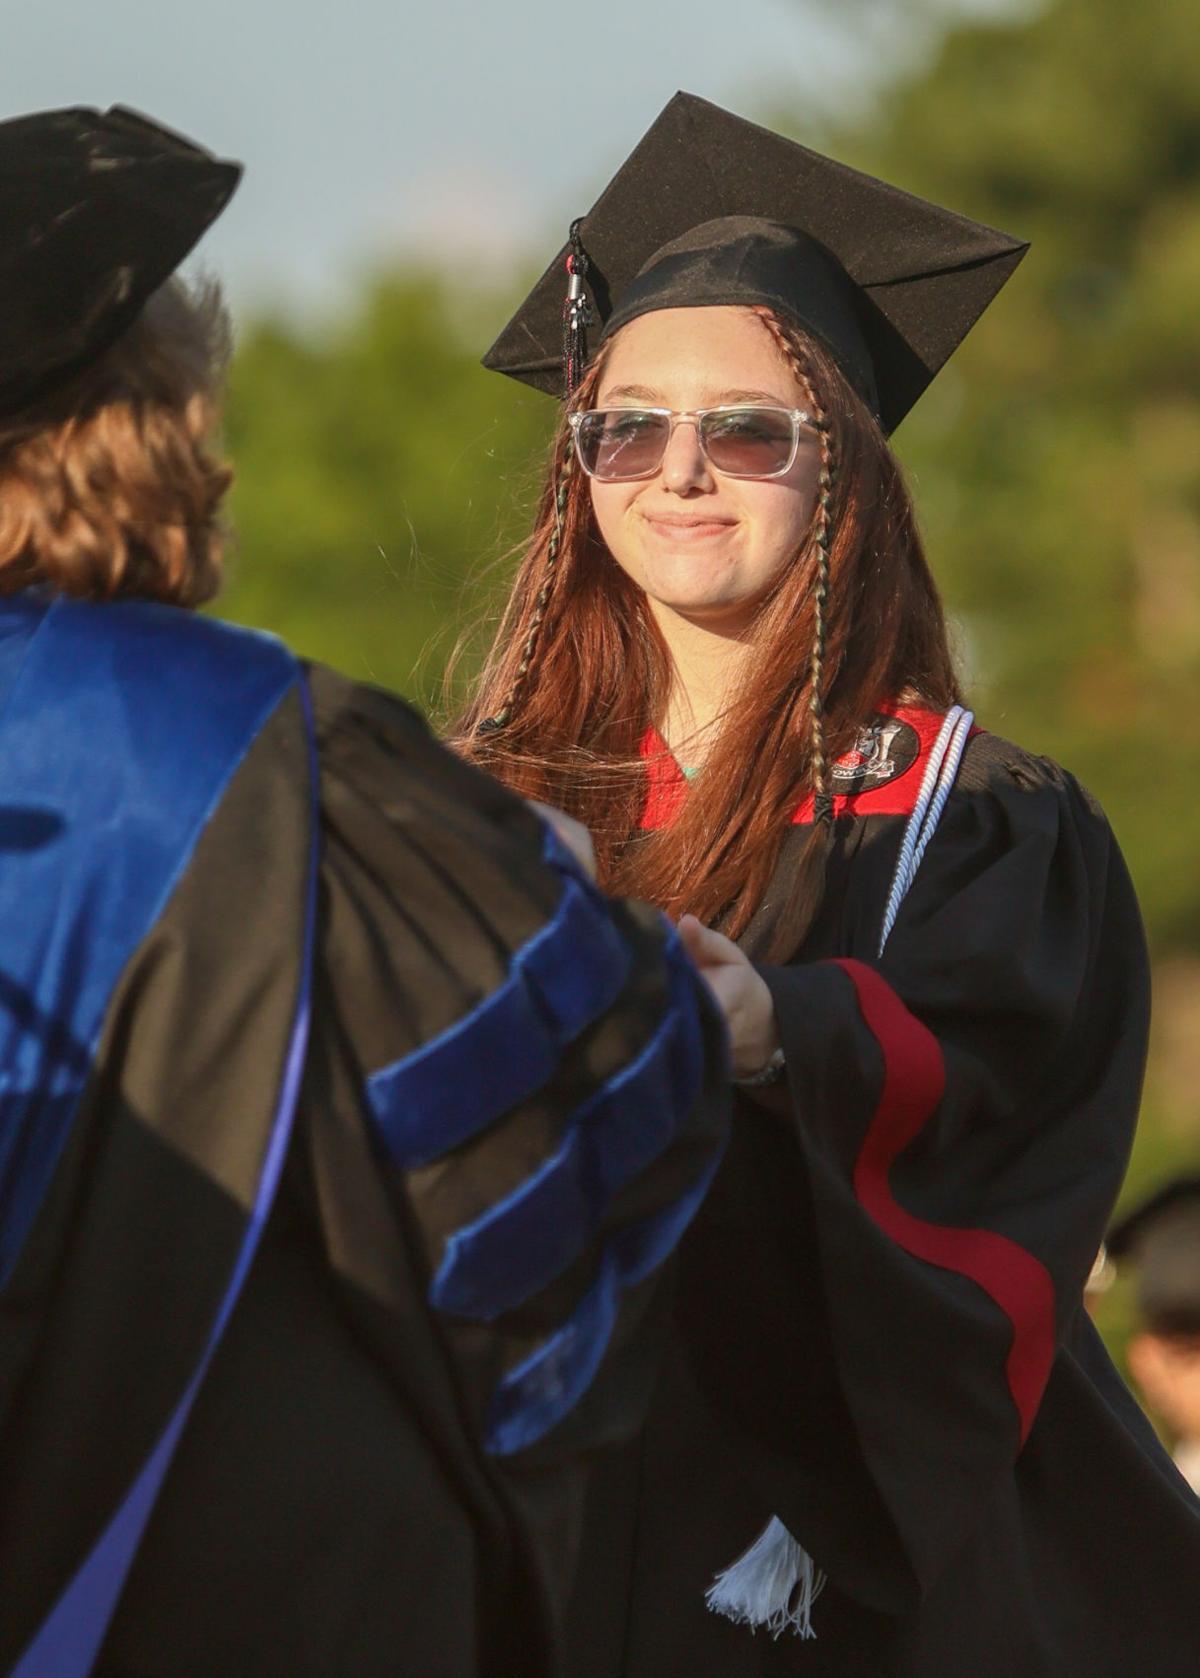 Lowell High School graduation ceremony